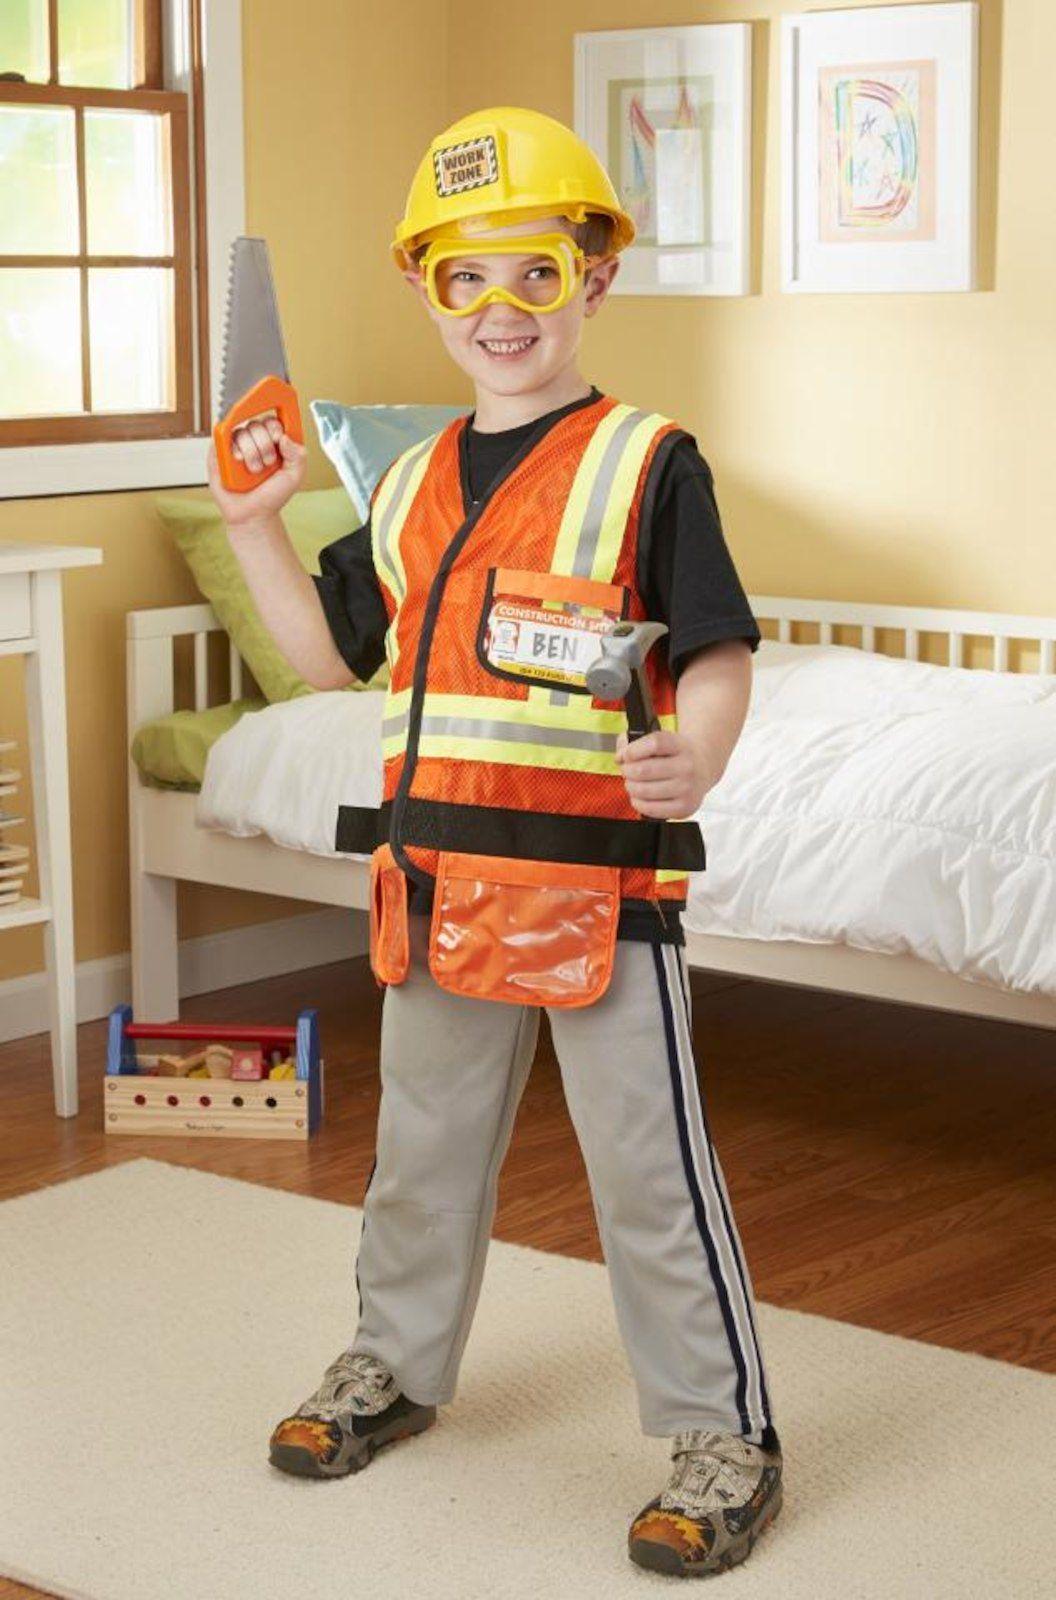 Melissa u doug construction worker role play set bradley